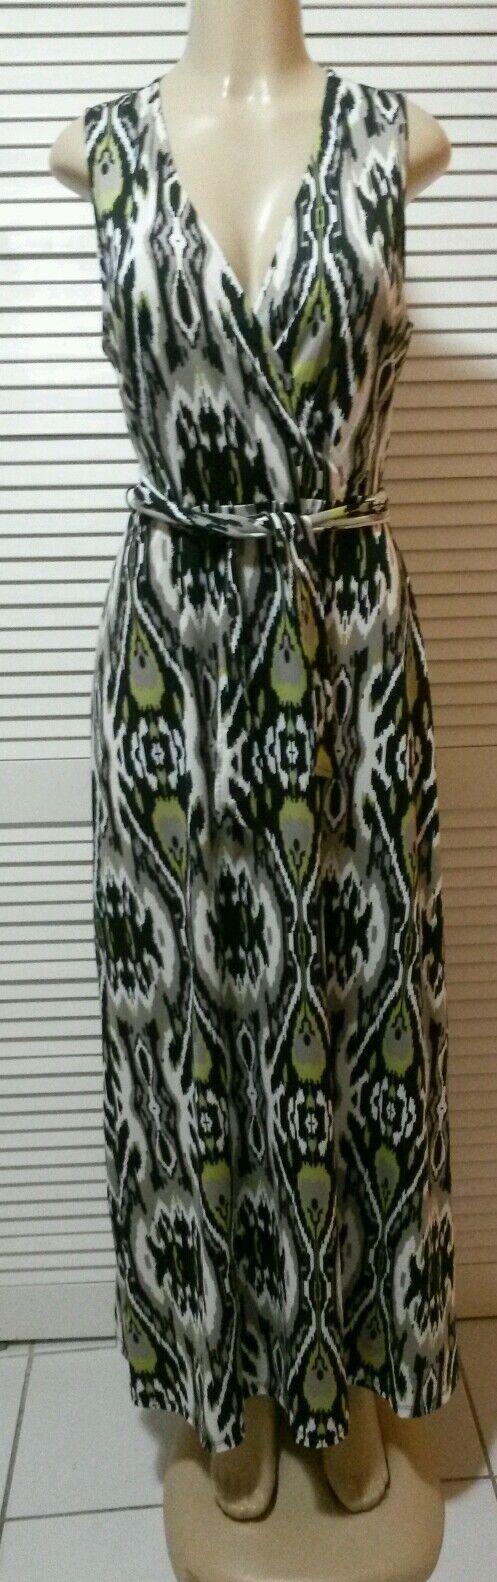 INC International Concepts Multicolor Printed Fauxwrap Maxi Dress Size Large